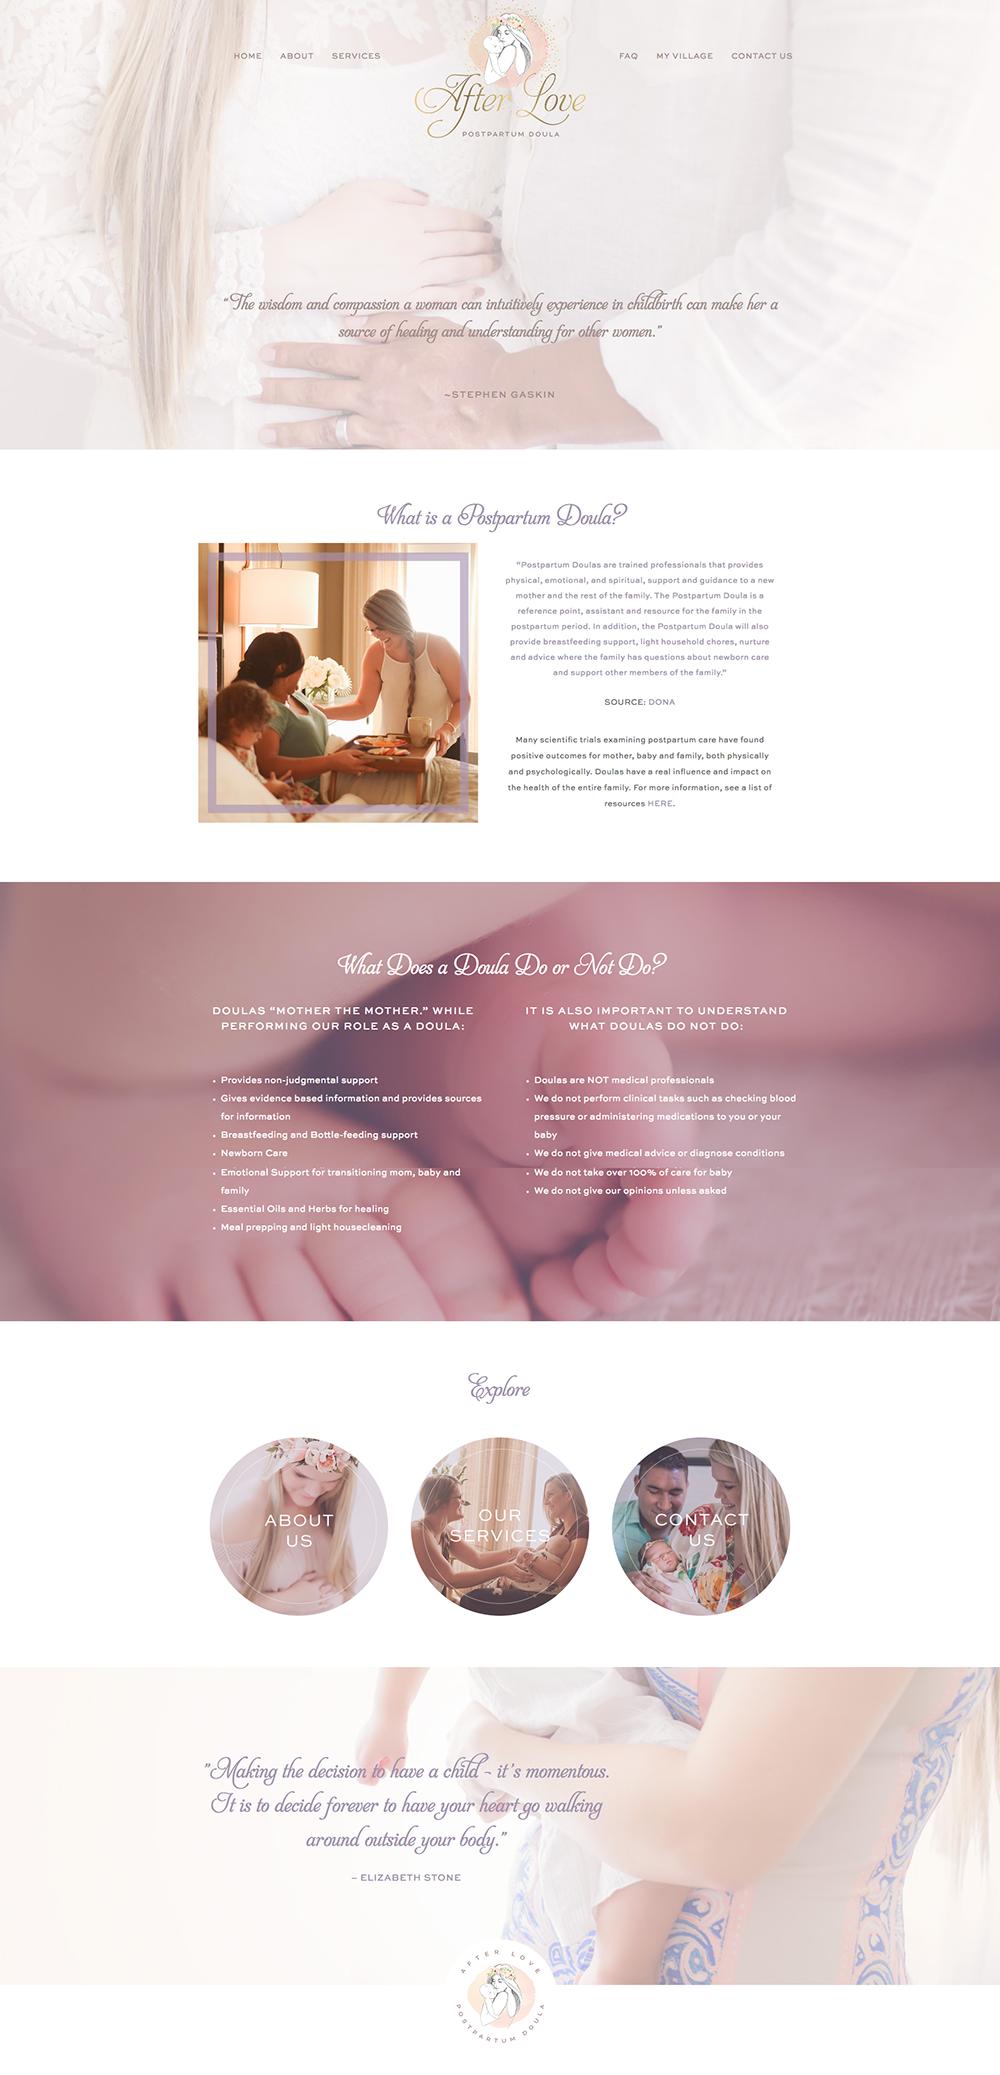 homepage screenshot of AfterLoveDoula.com, designed by Fancy Girl Design Studio